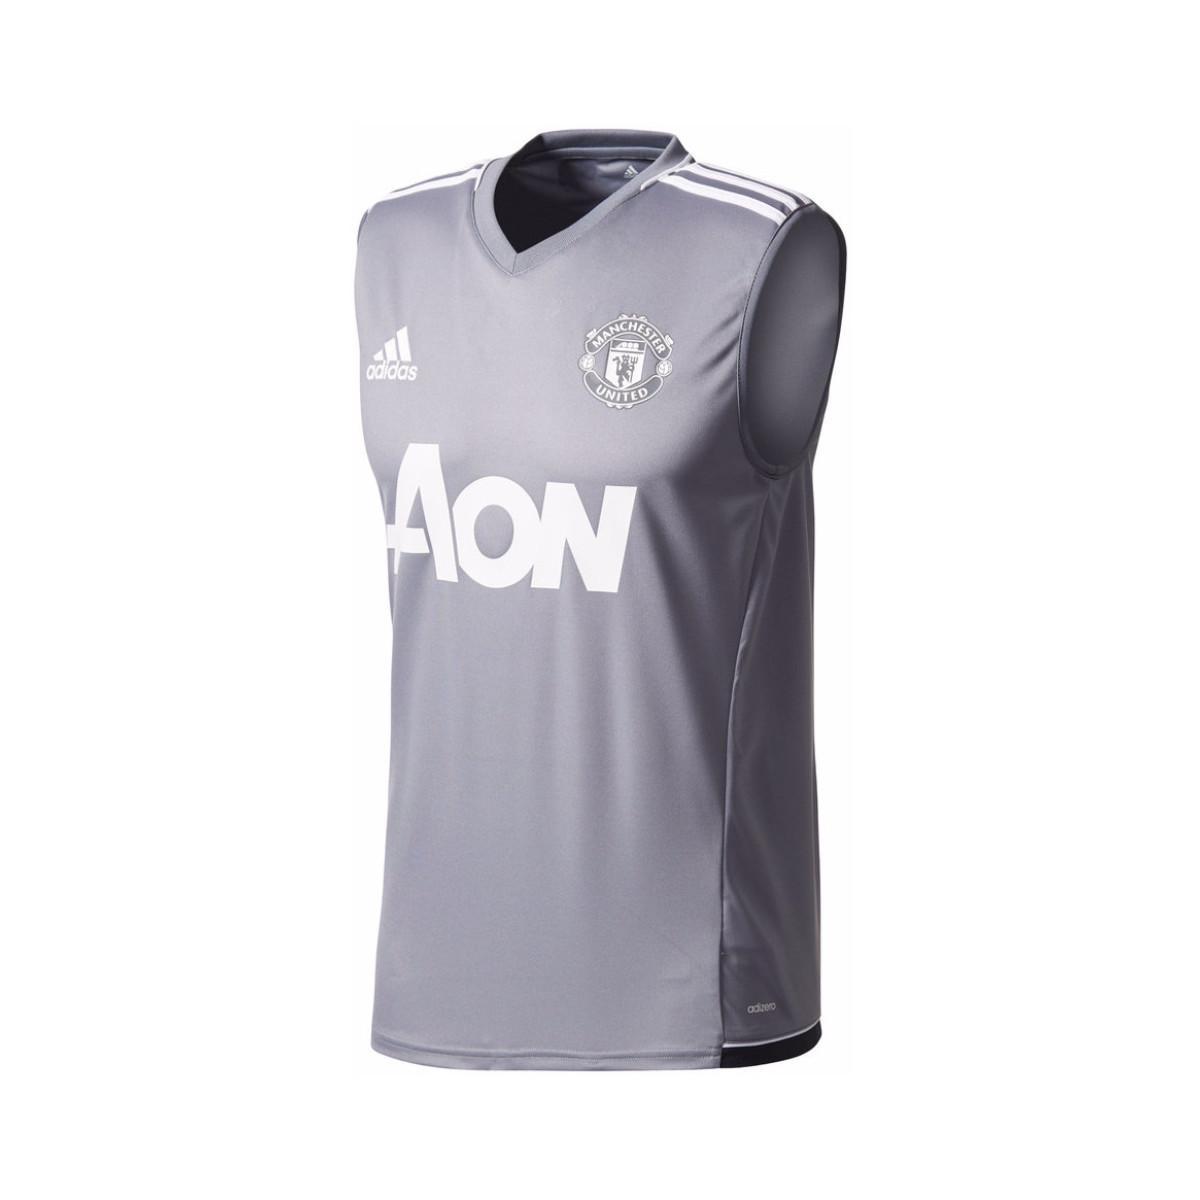 9a91e587e adidas 2017-2018 Man Utd Sleeveless Training Shirt Men s Vest Top In ...